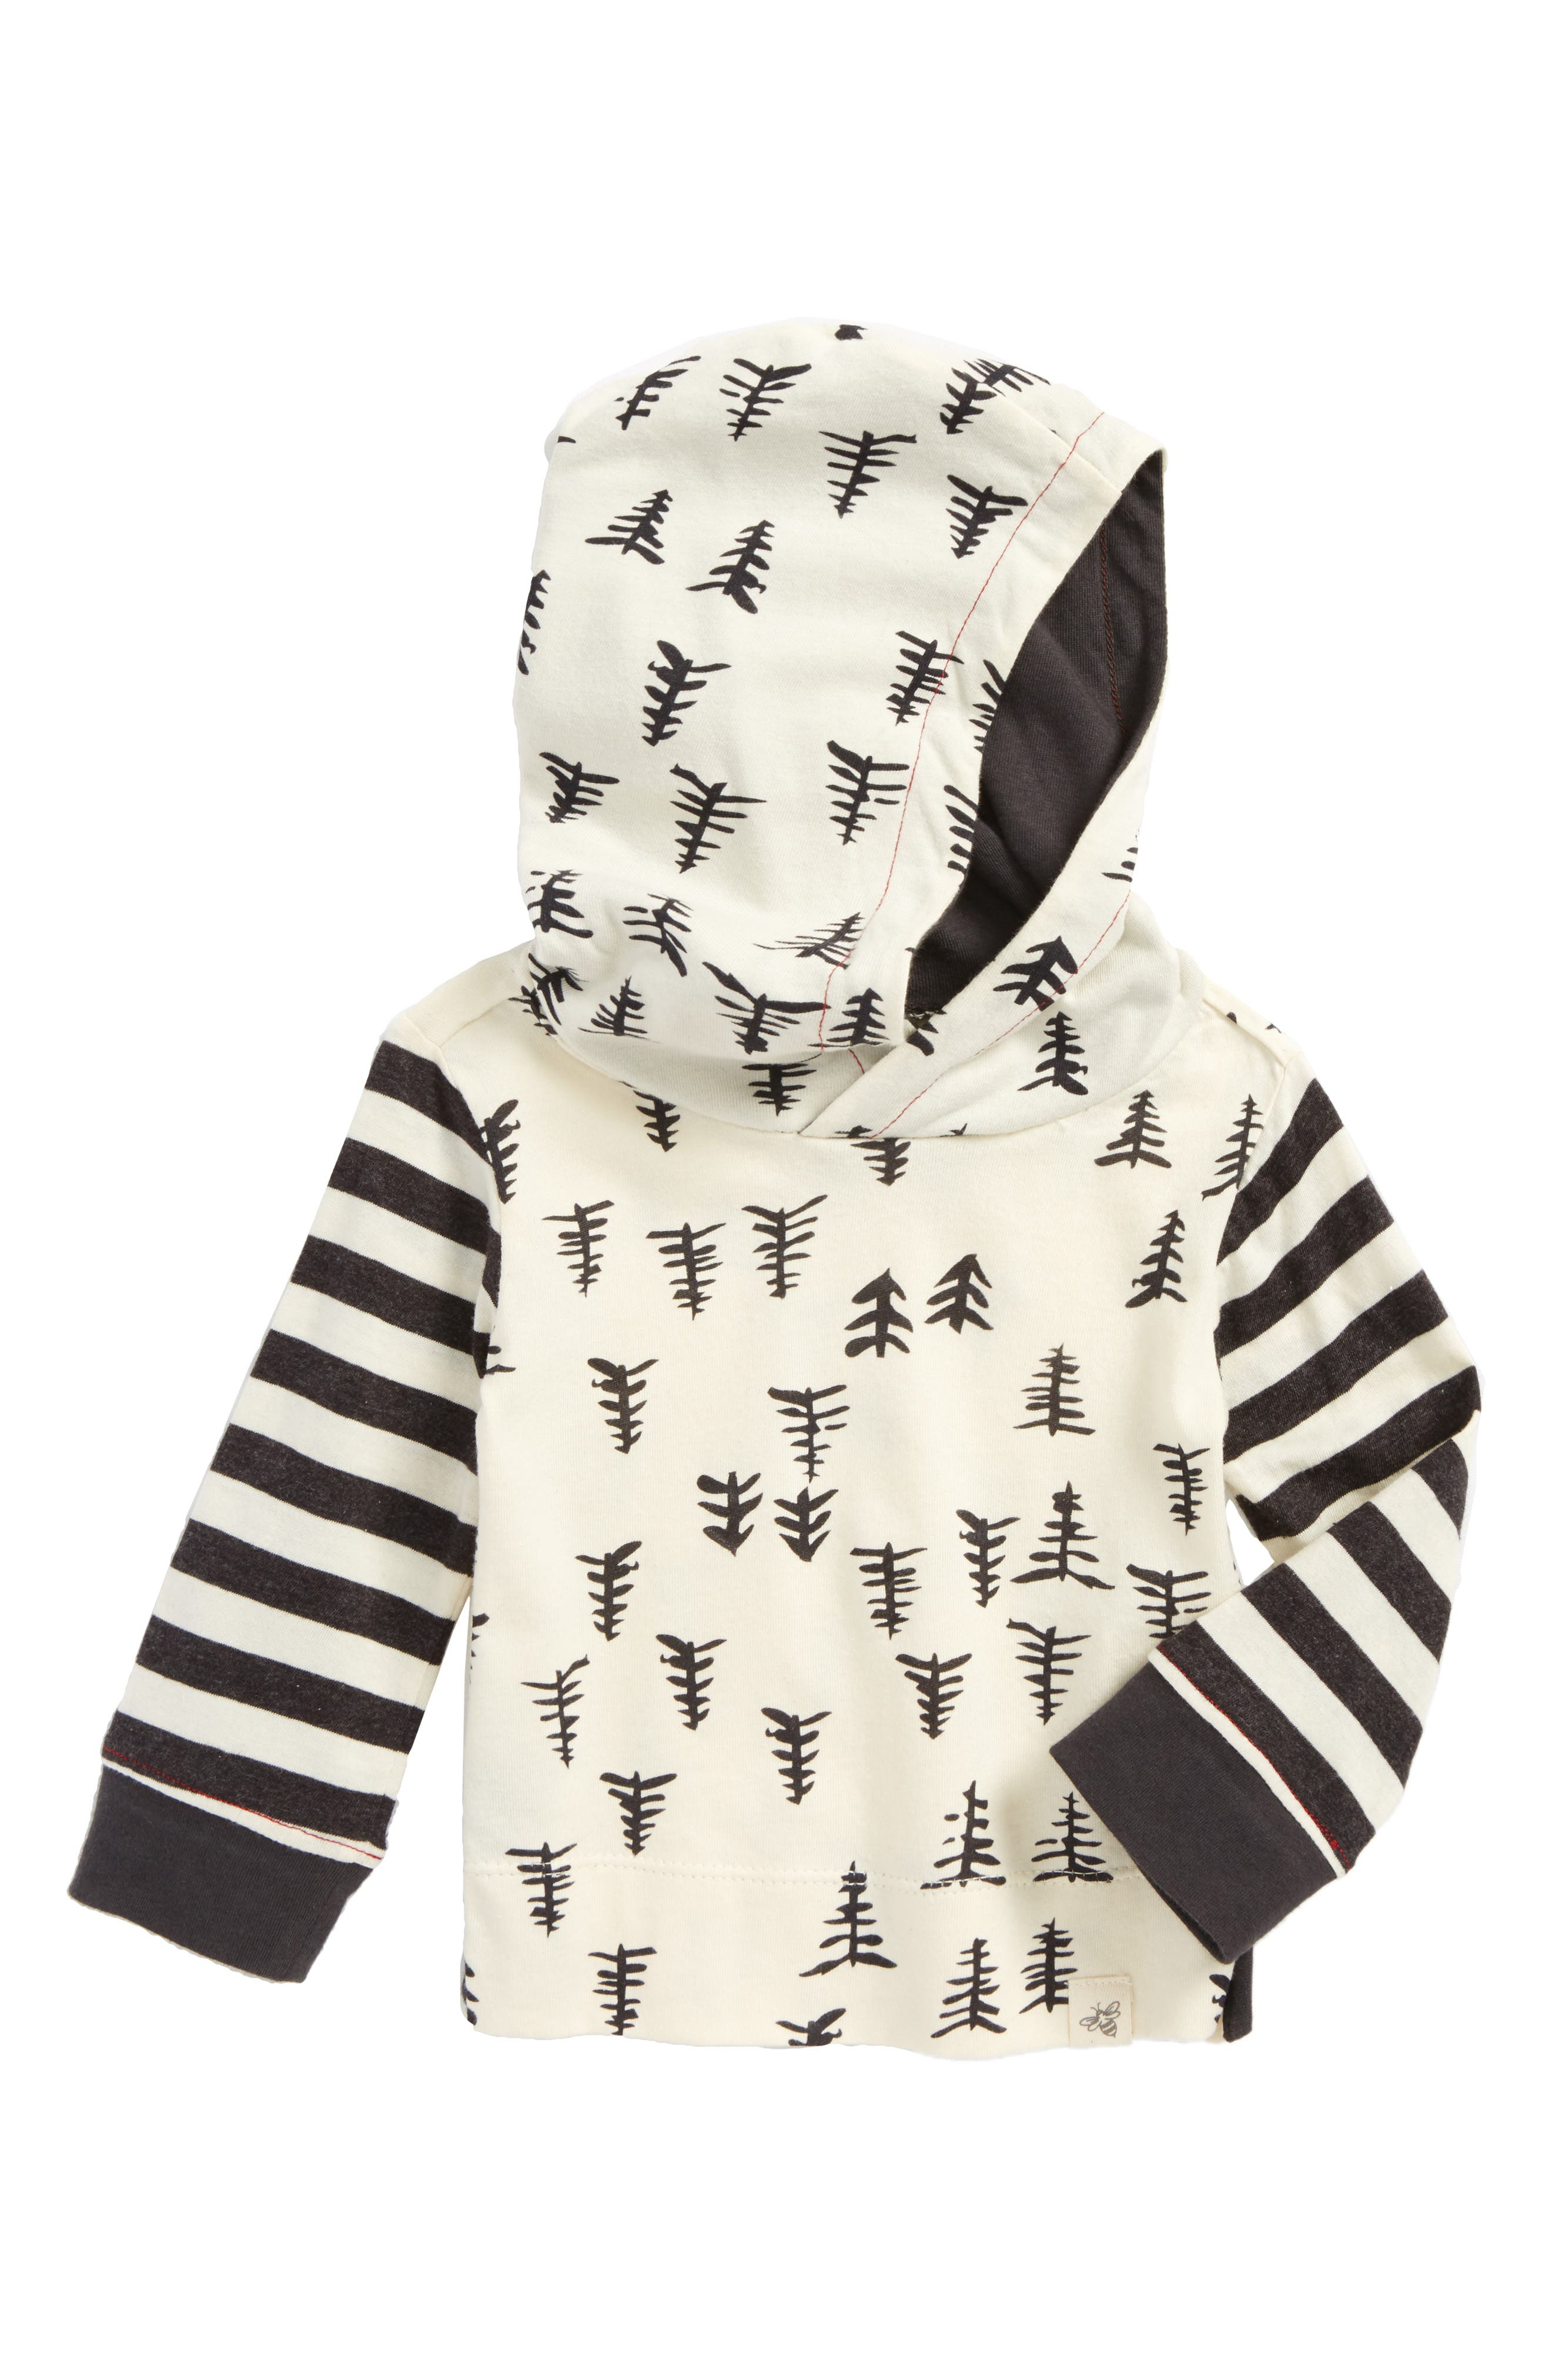 Burt's Bees Baby Trees & Stripes Organic Cotton Hooded T-Shirt (Baby Boys)